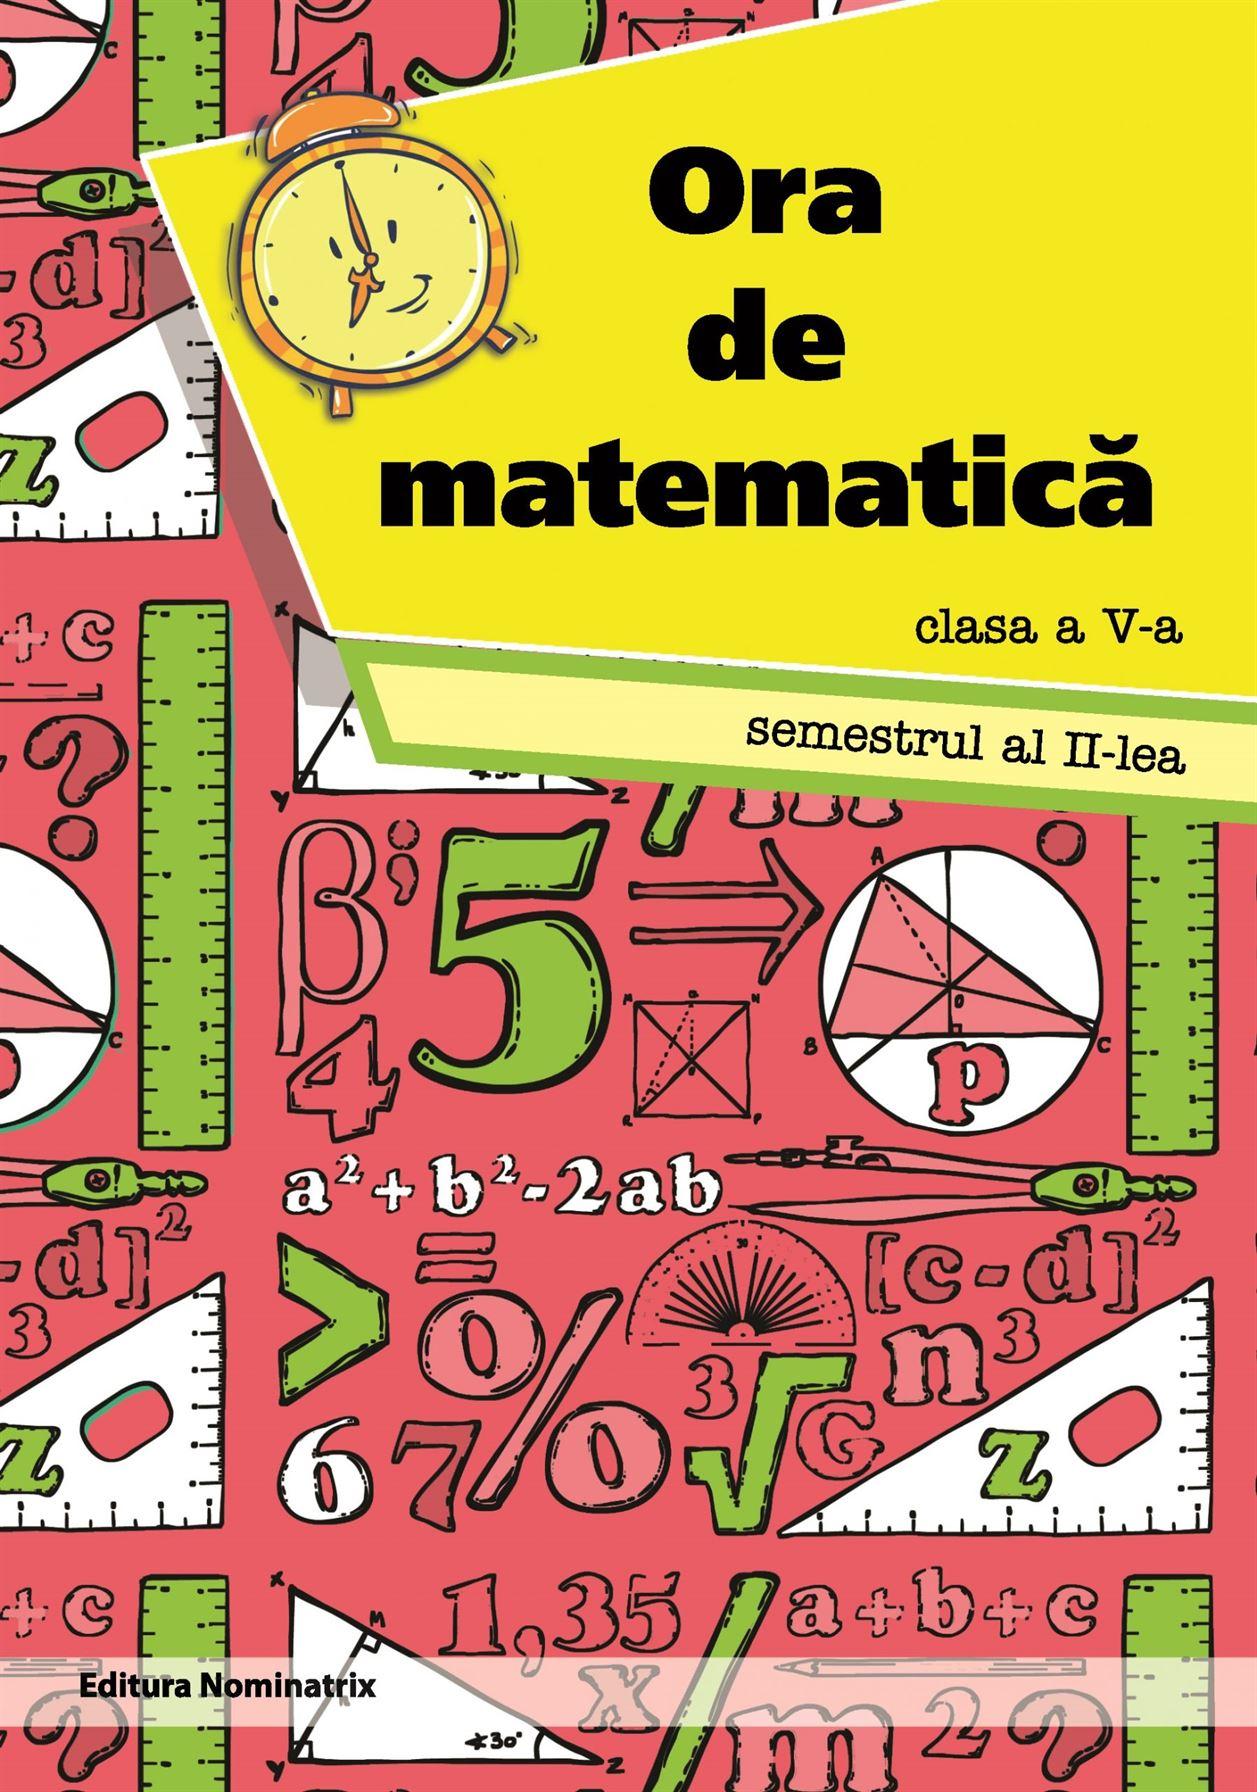 Ora de matematică, clasa a V-a, semestrul 2 1